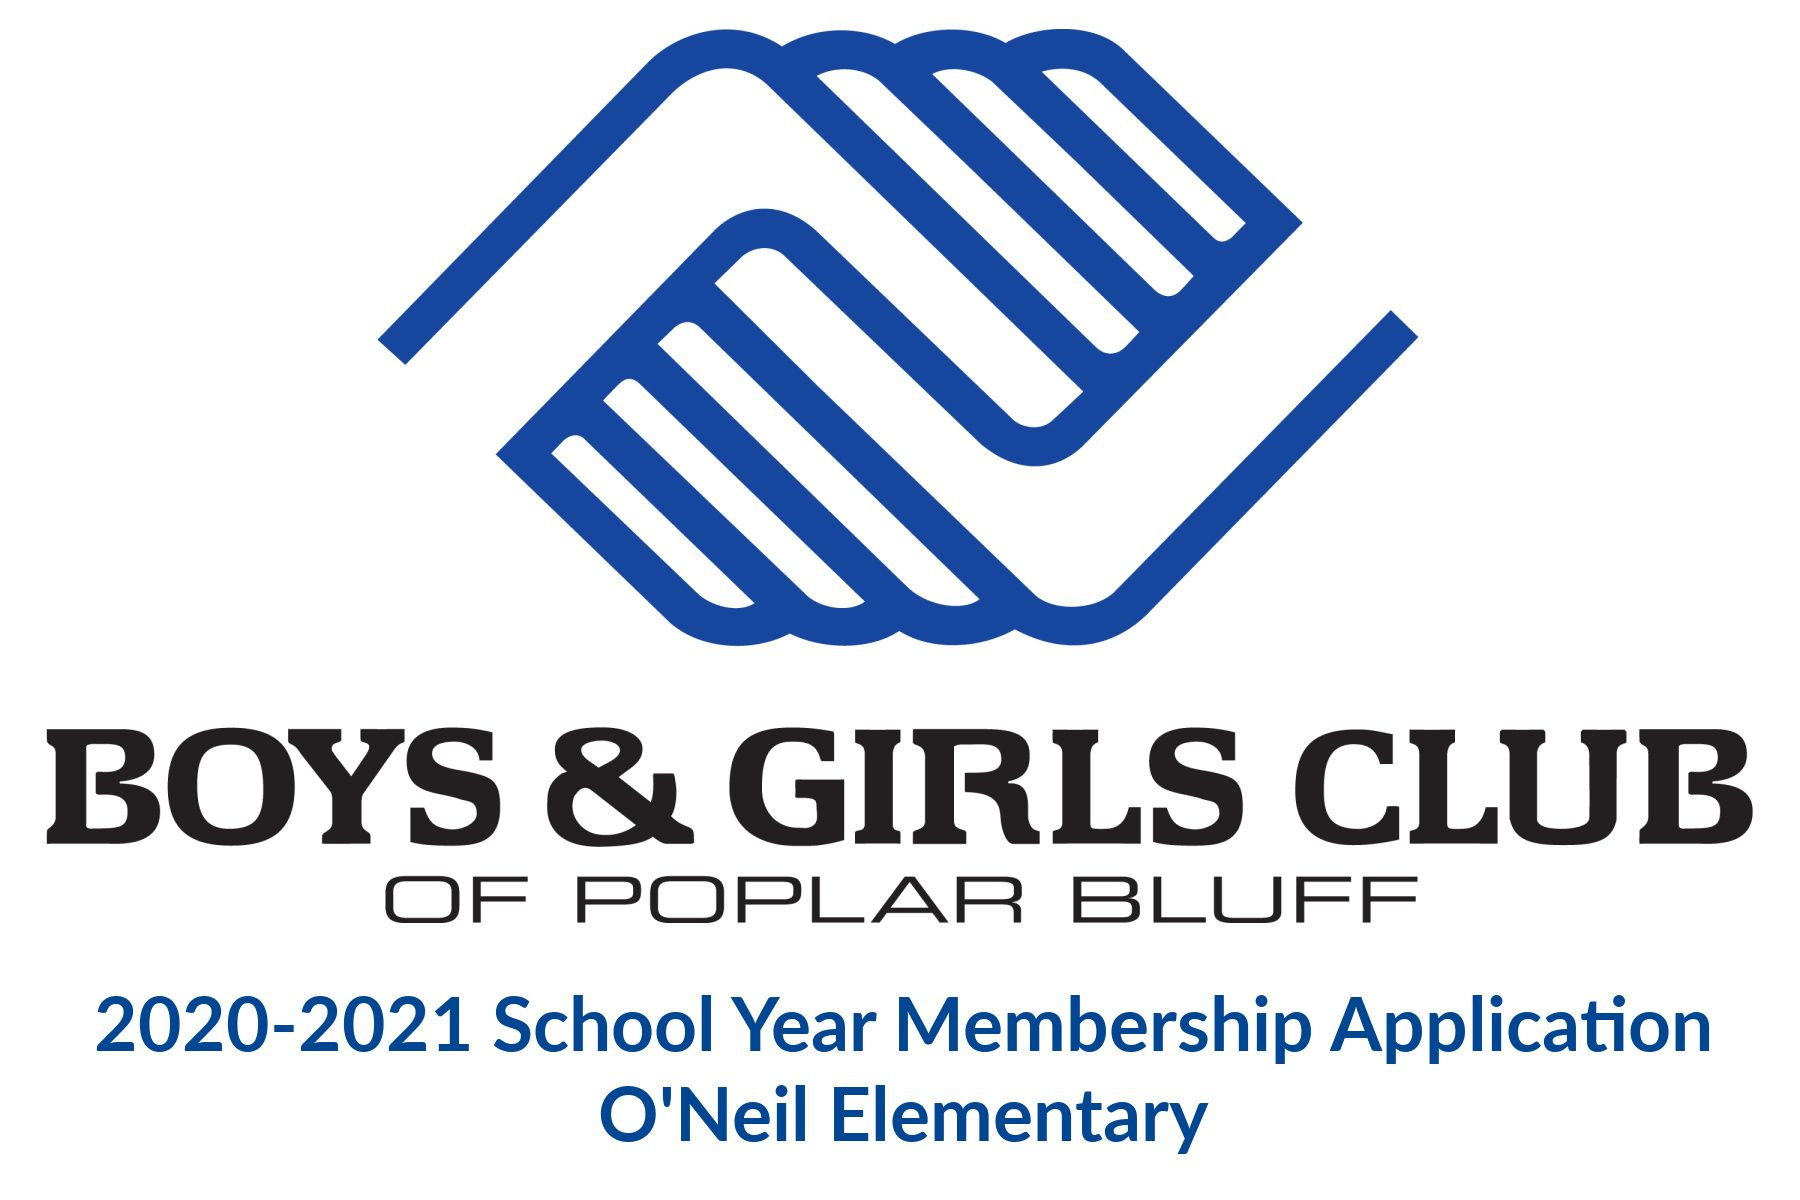 Boys & Girls Club Of Poplar Bluff : Parent Portal : 2020 Intended For Boys And Girls Club Calendar 2021